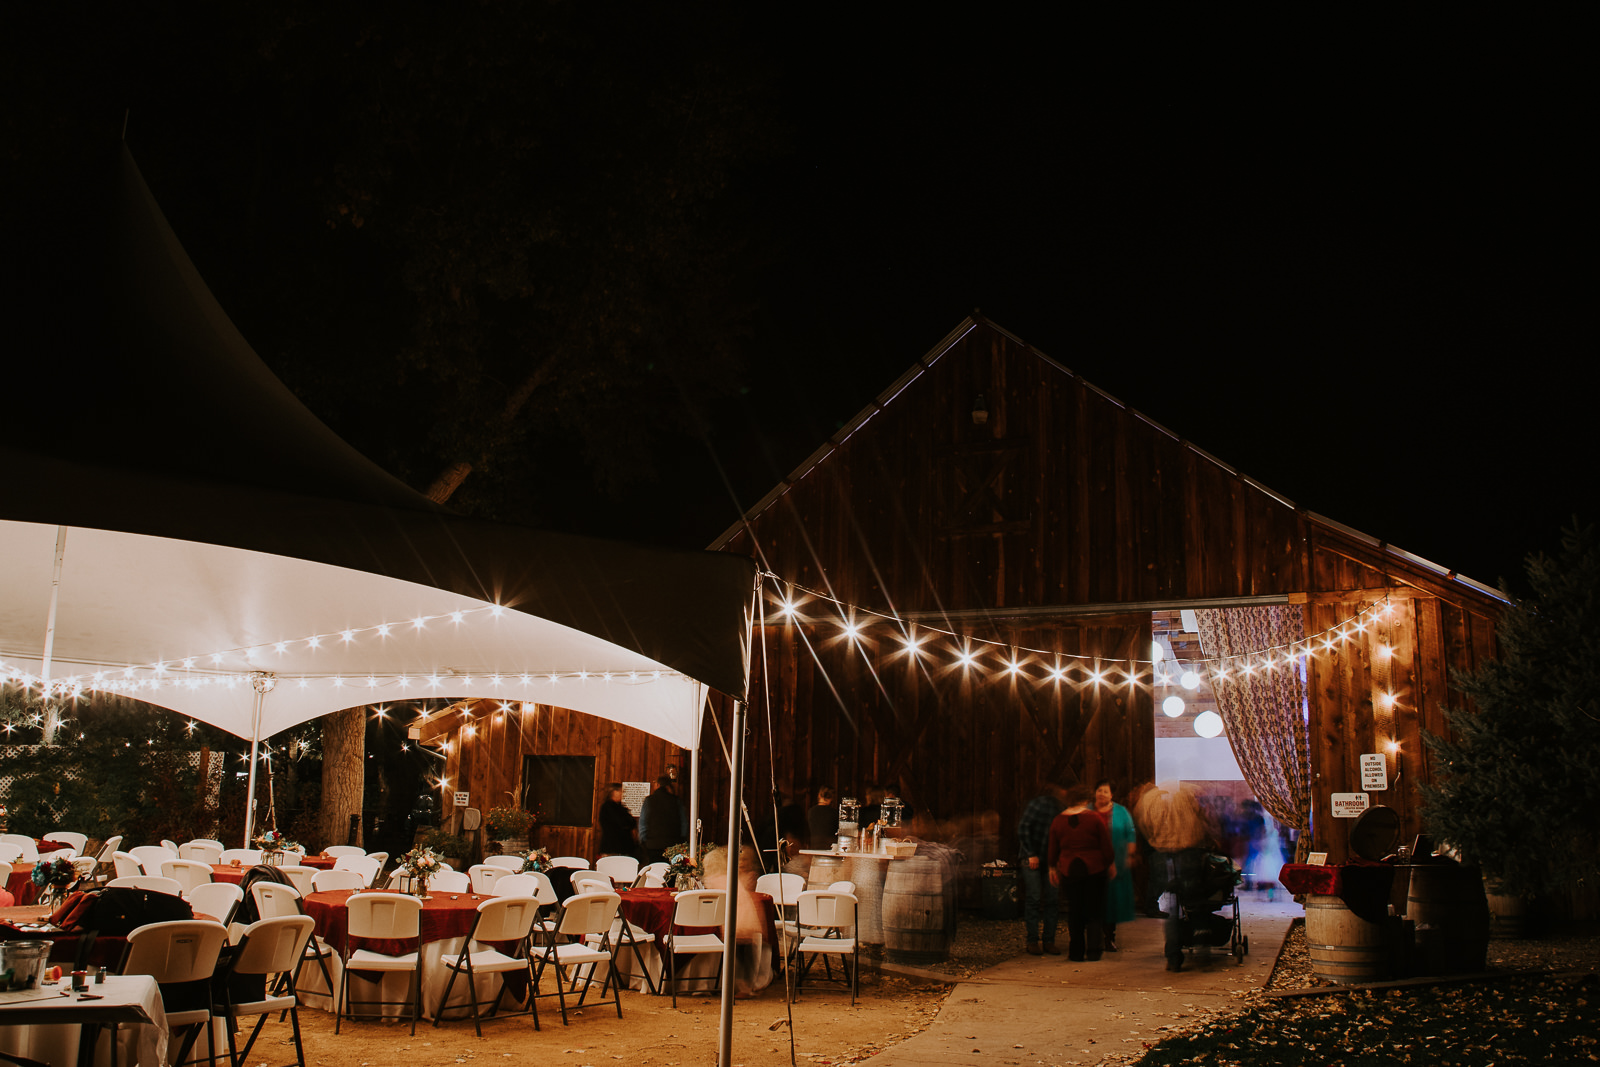 Maison La Belle Vie Amy's Courtyard night long exposure wedding